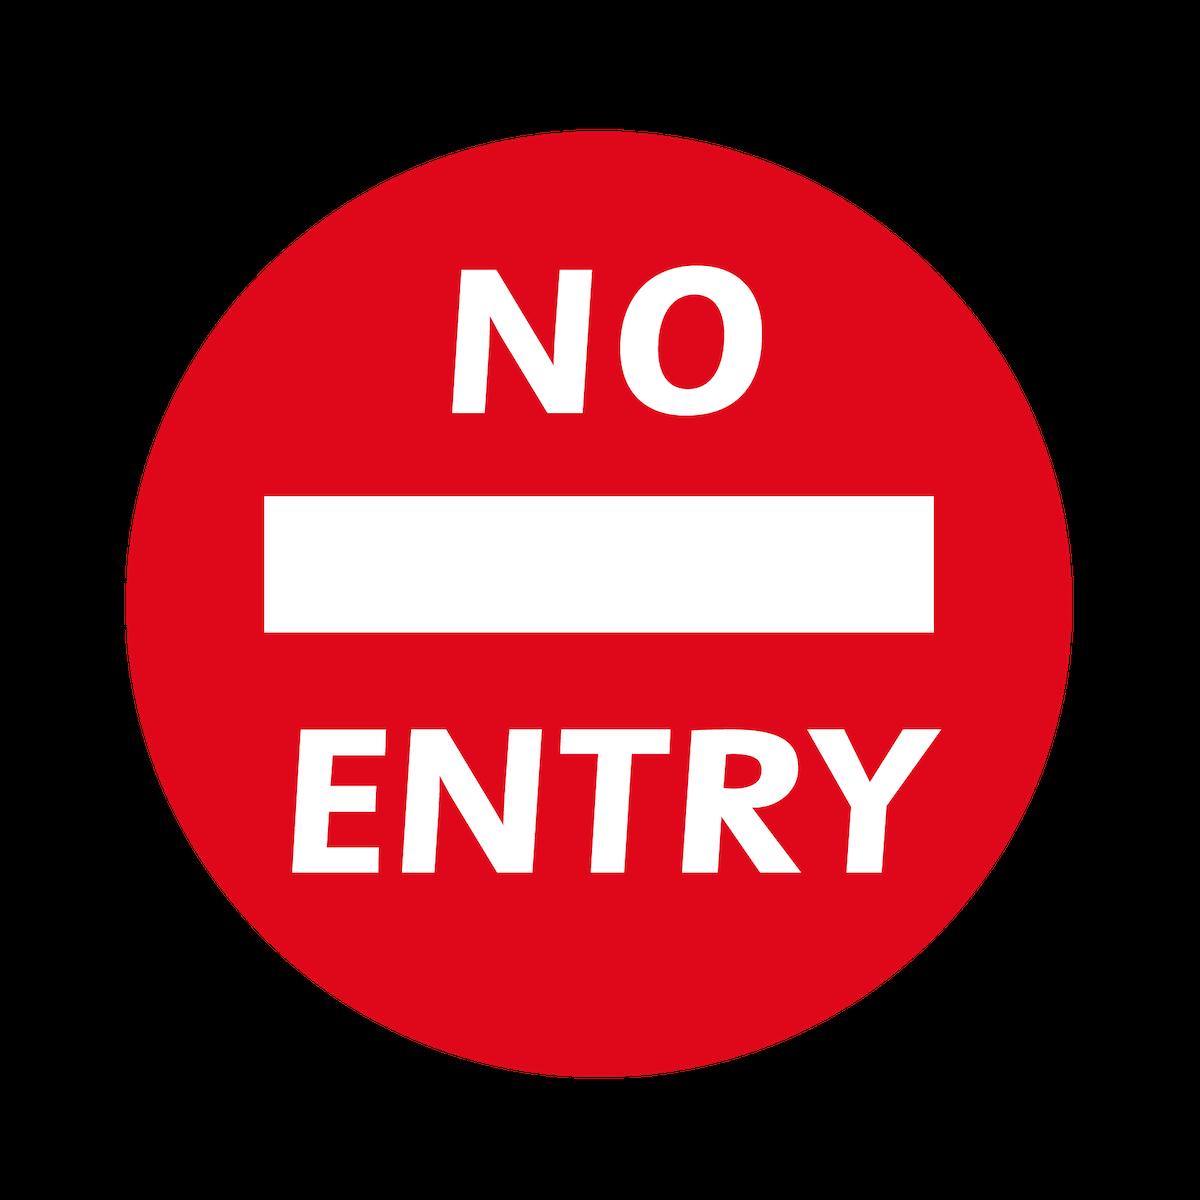 Playground Marking No Entry